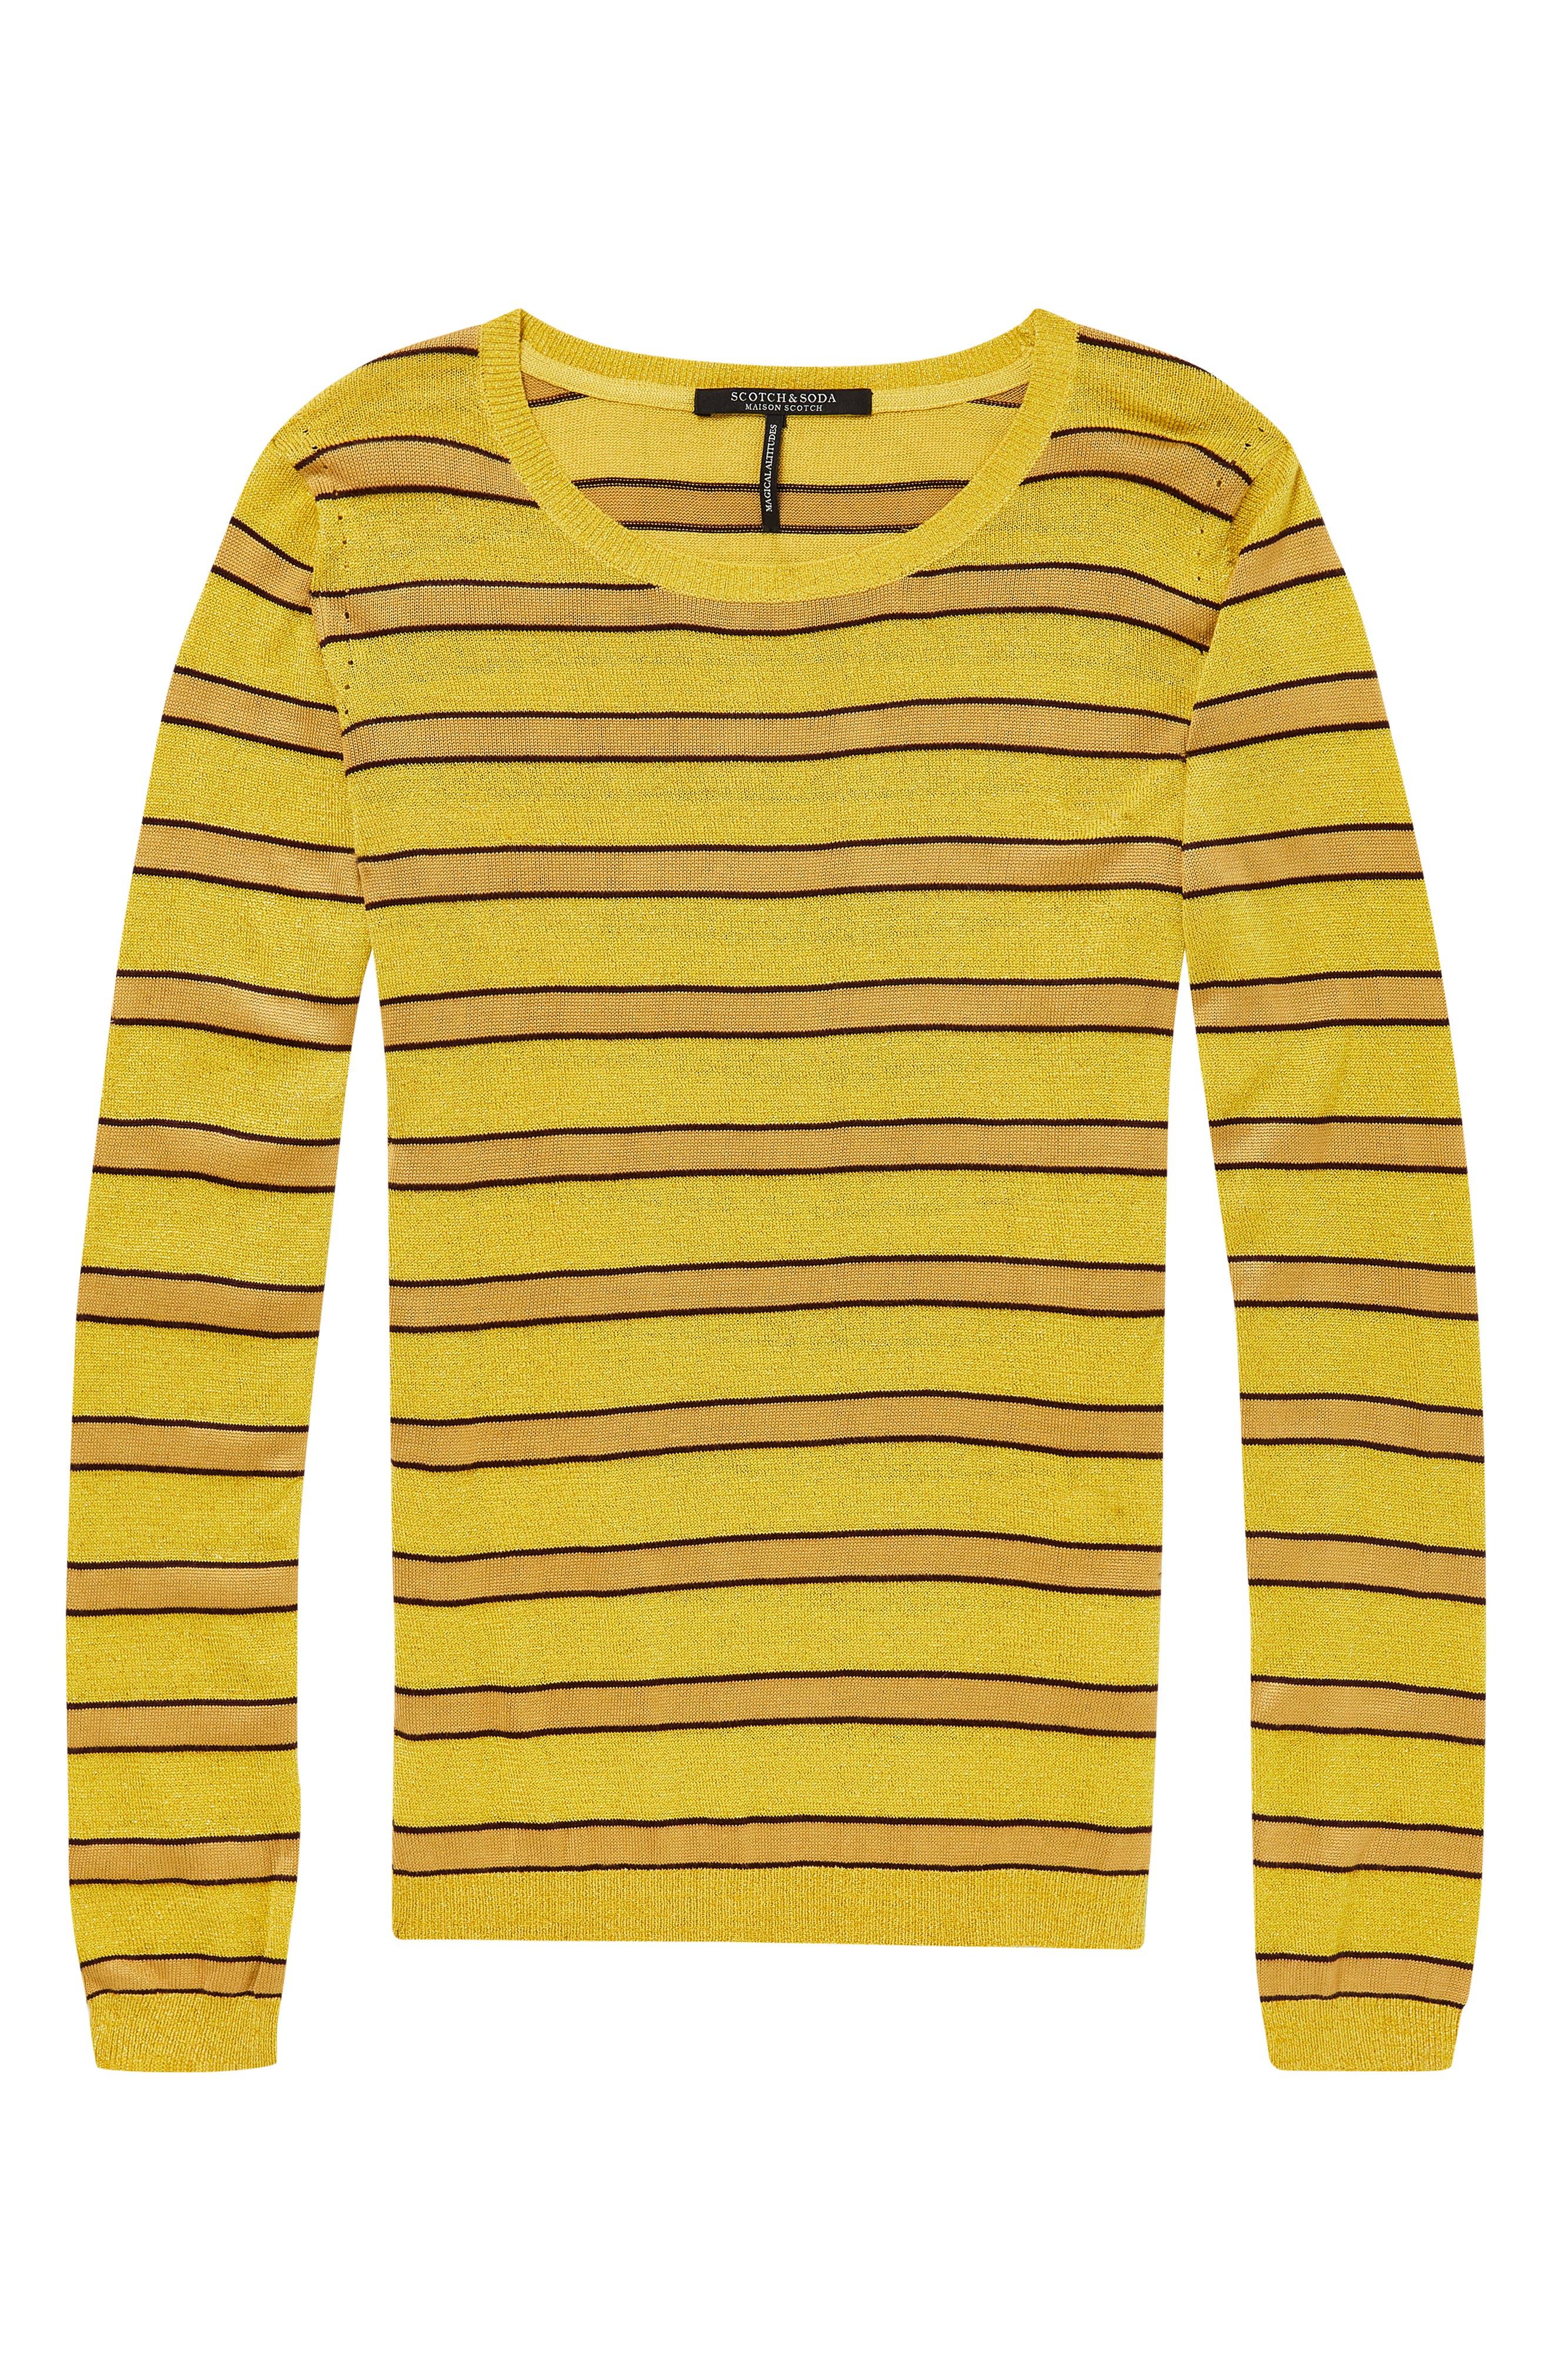 Stripe Crewneck Sweater,                             Alternate thumbnail 3, color,                             730